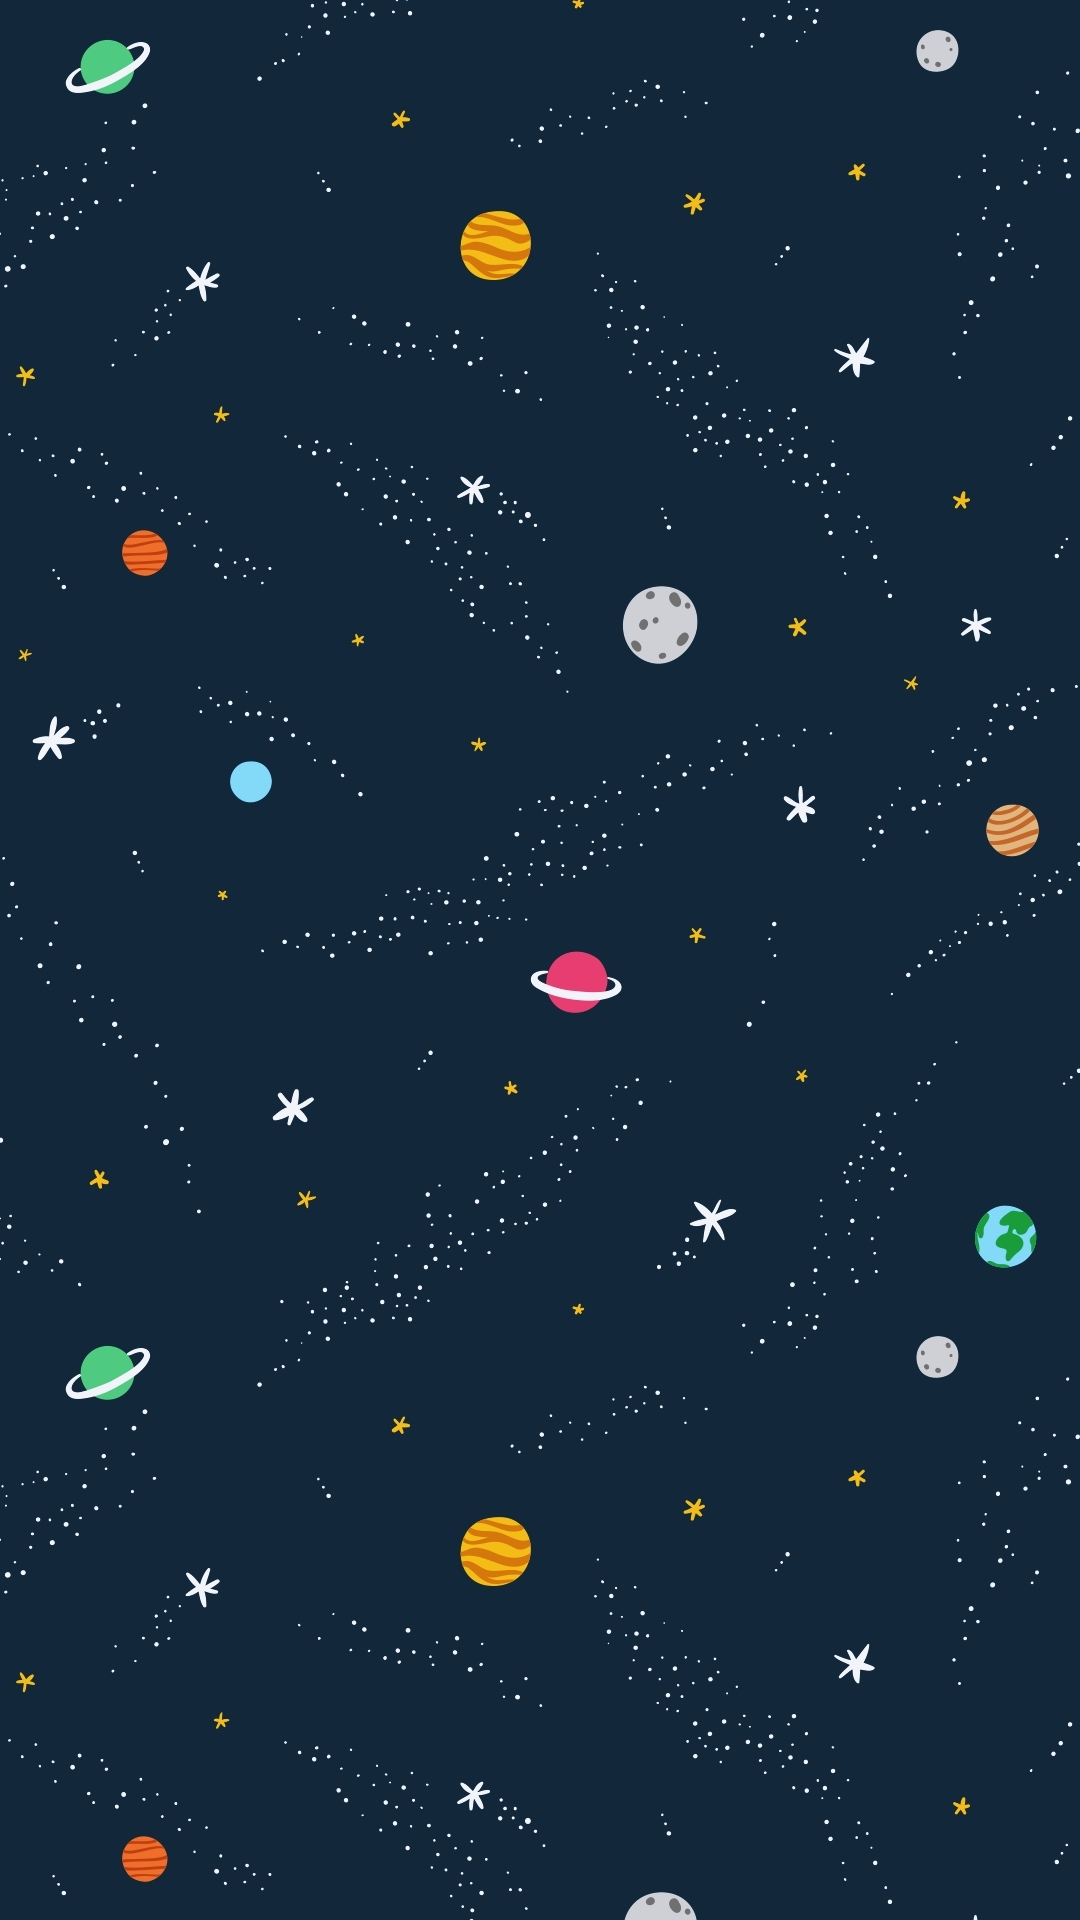 iPhone wallpaper planets2 Illustration